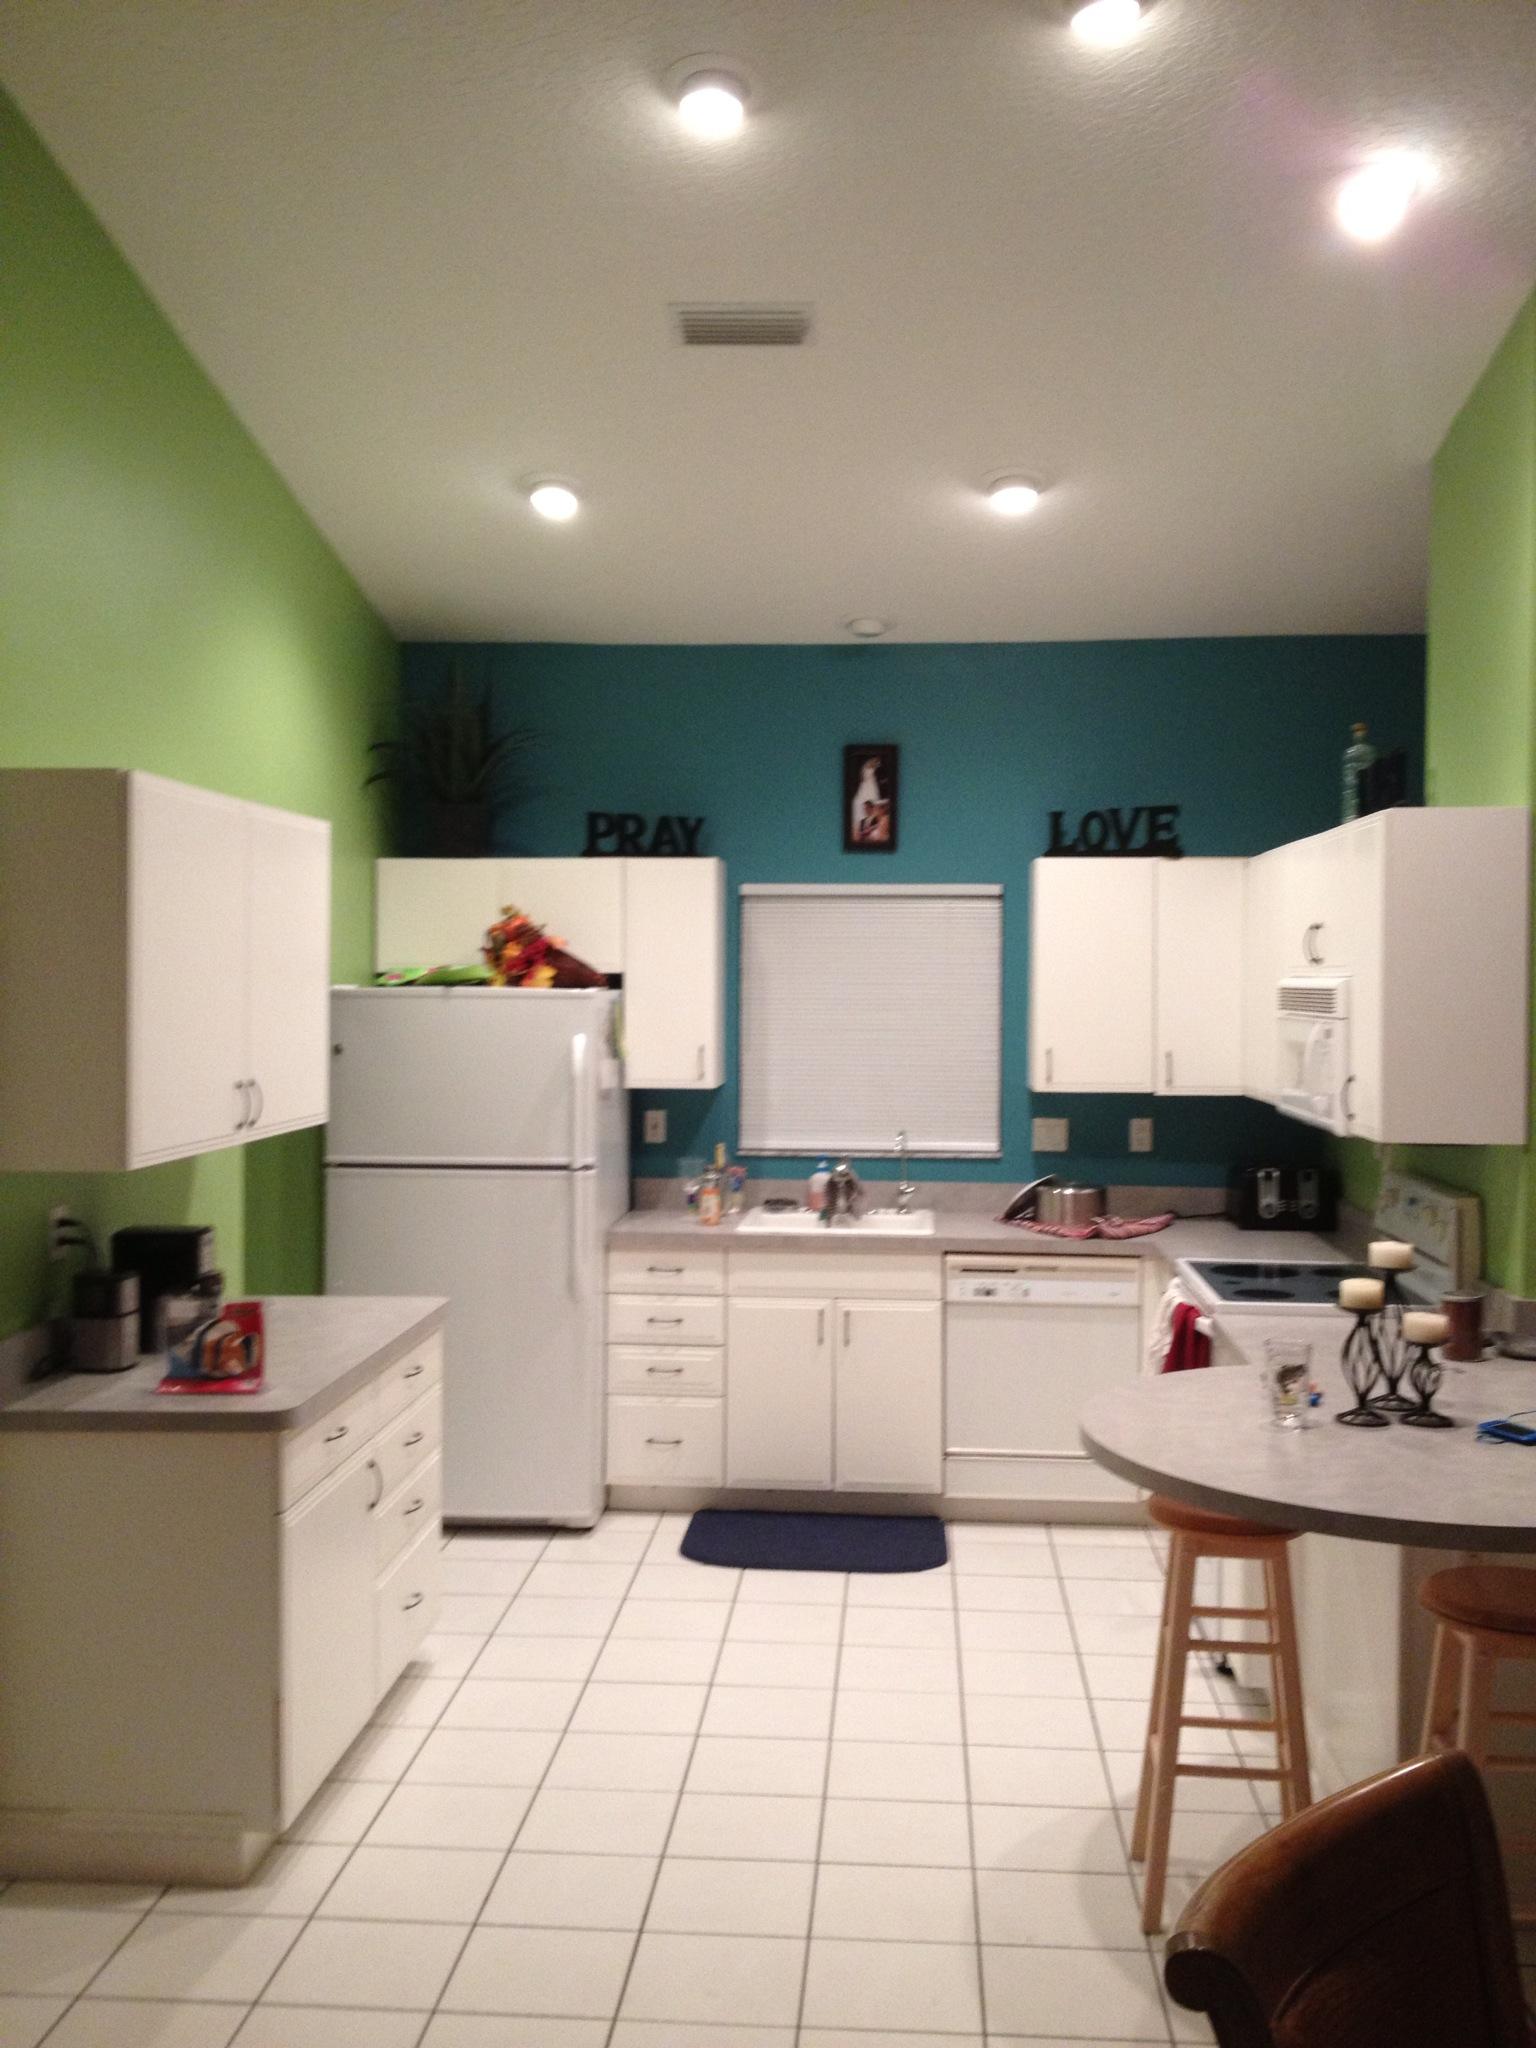 venice florida interior repaint colors burnett 1 800 painting